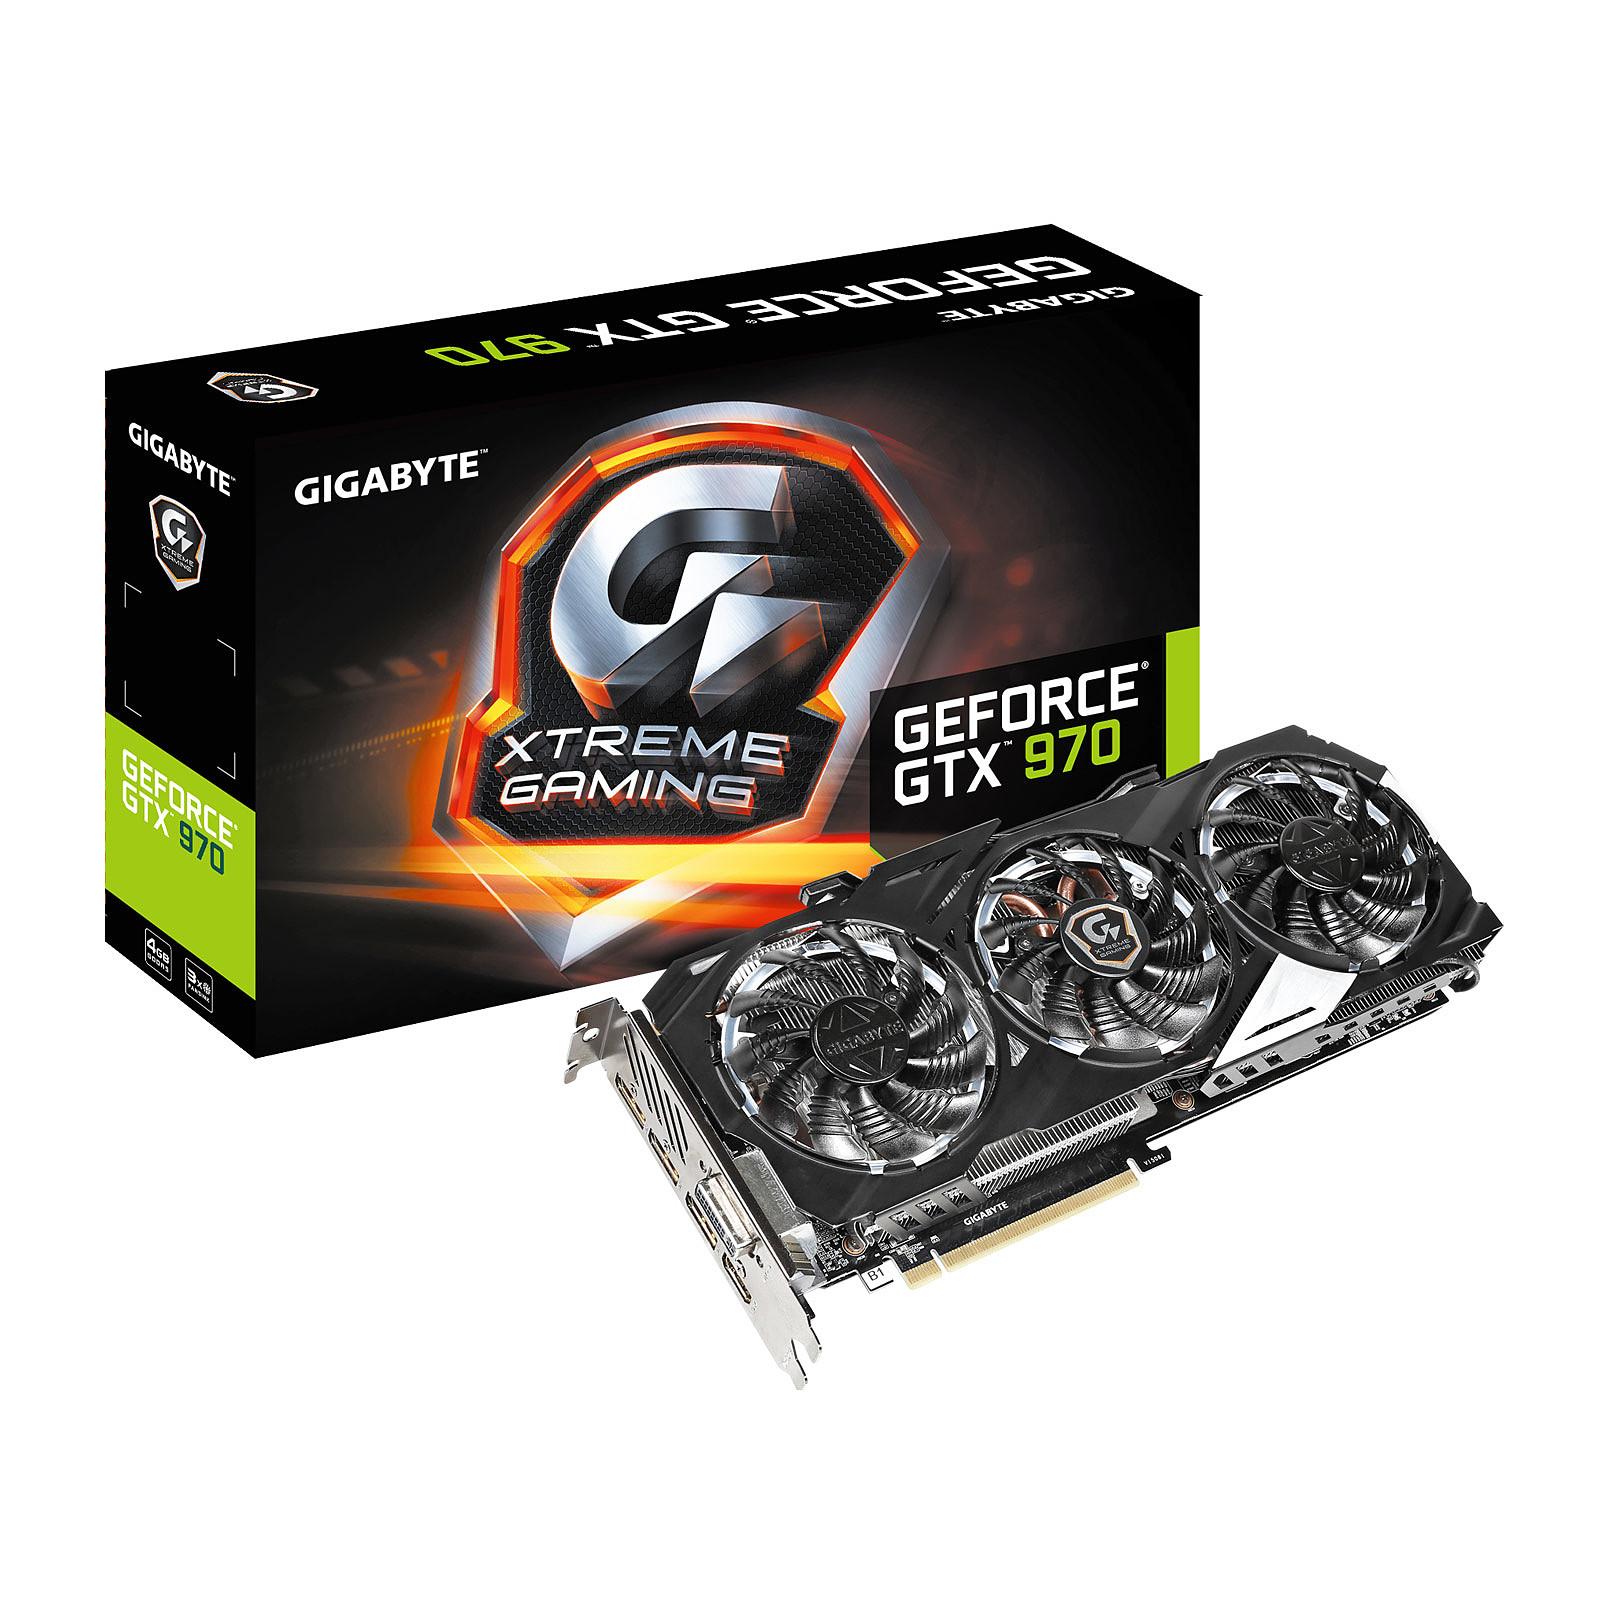 Gigabyte GV-N970XTREME-4GD - GeForce GTX 970 4 GB